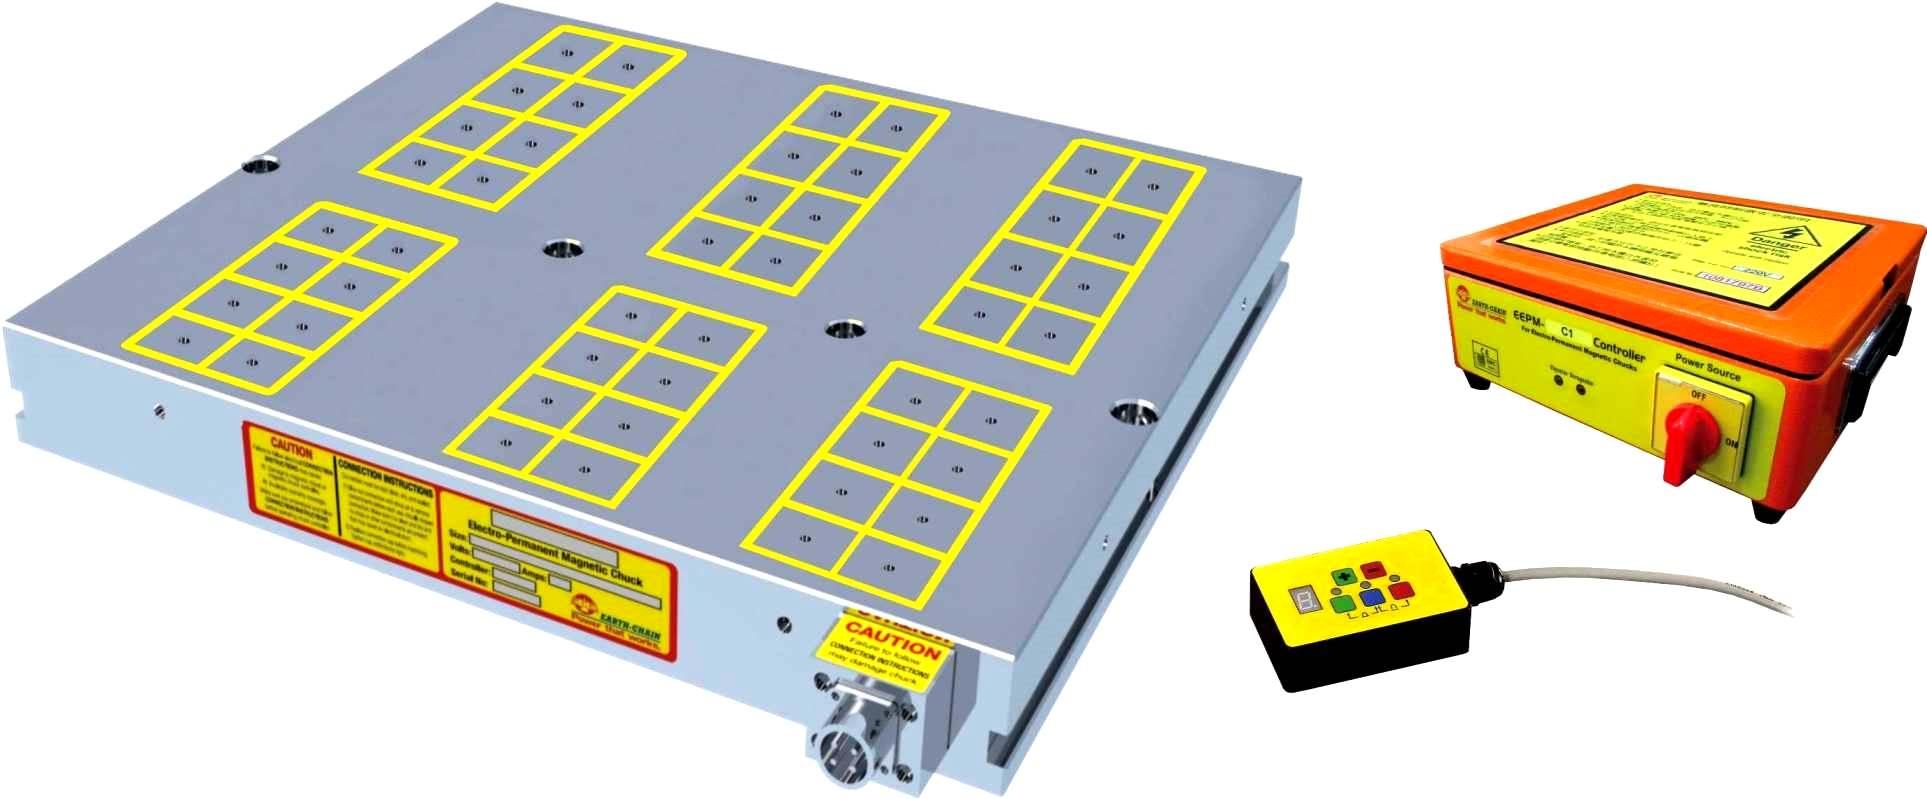 <span>Electro-Permanent Magnetic Chuck</span><span>EEPM-BF Series</span>